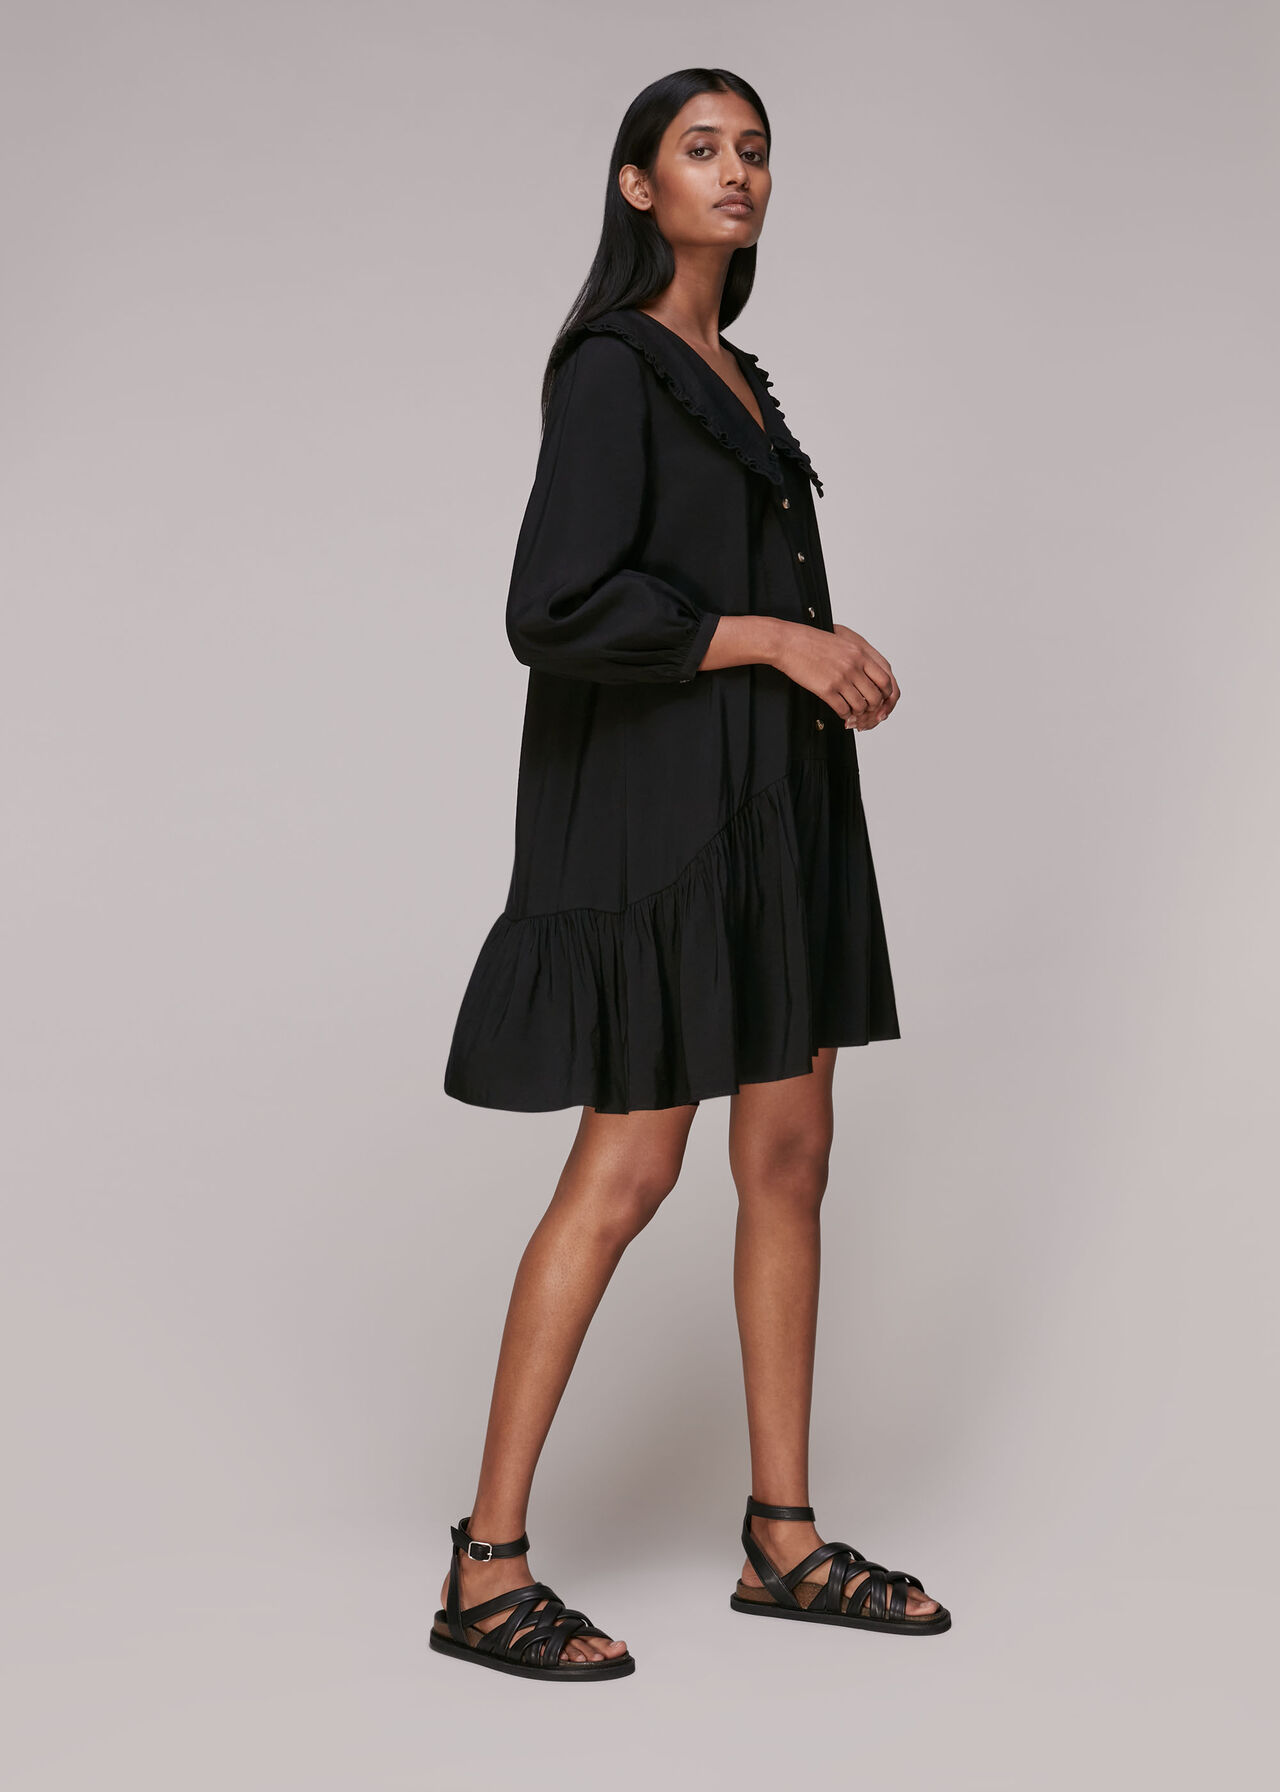 Emery Collar Detail Dress